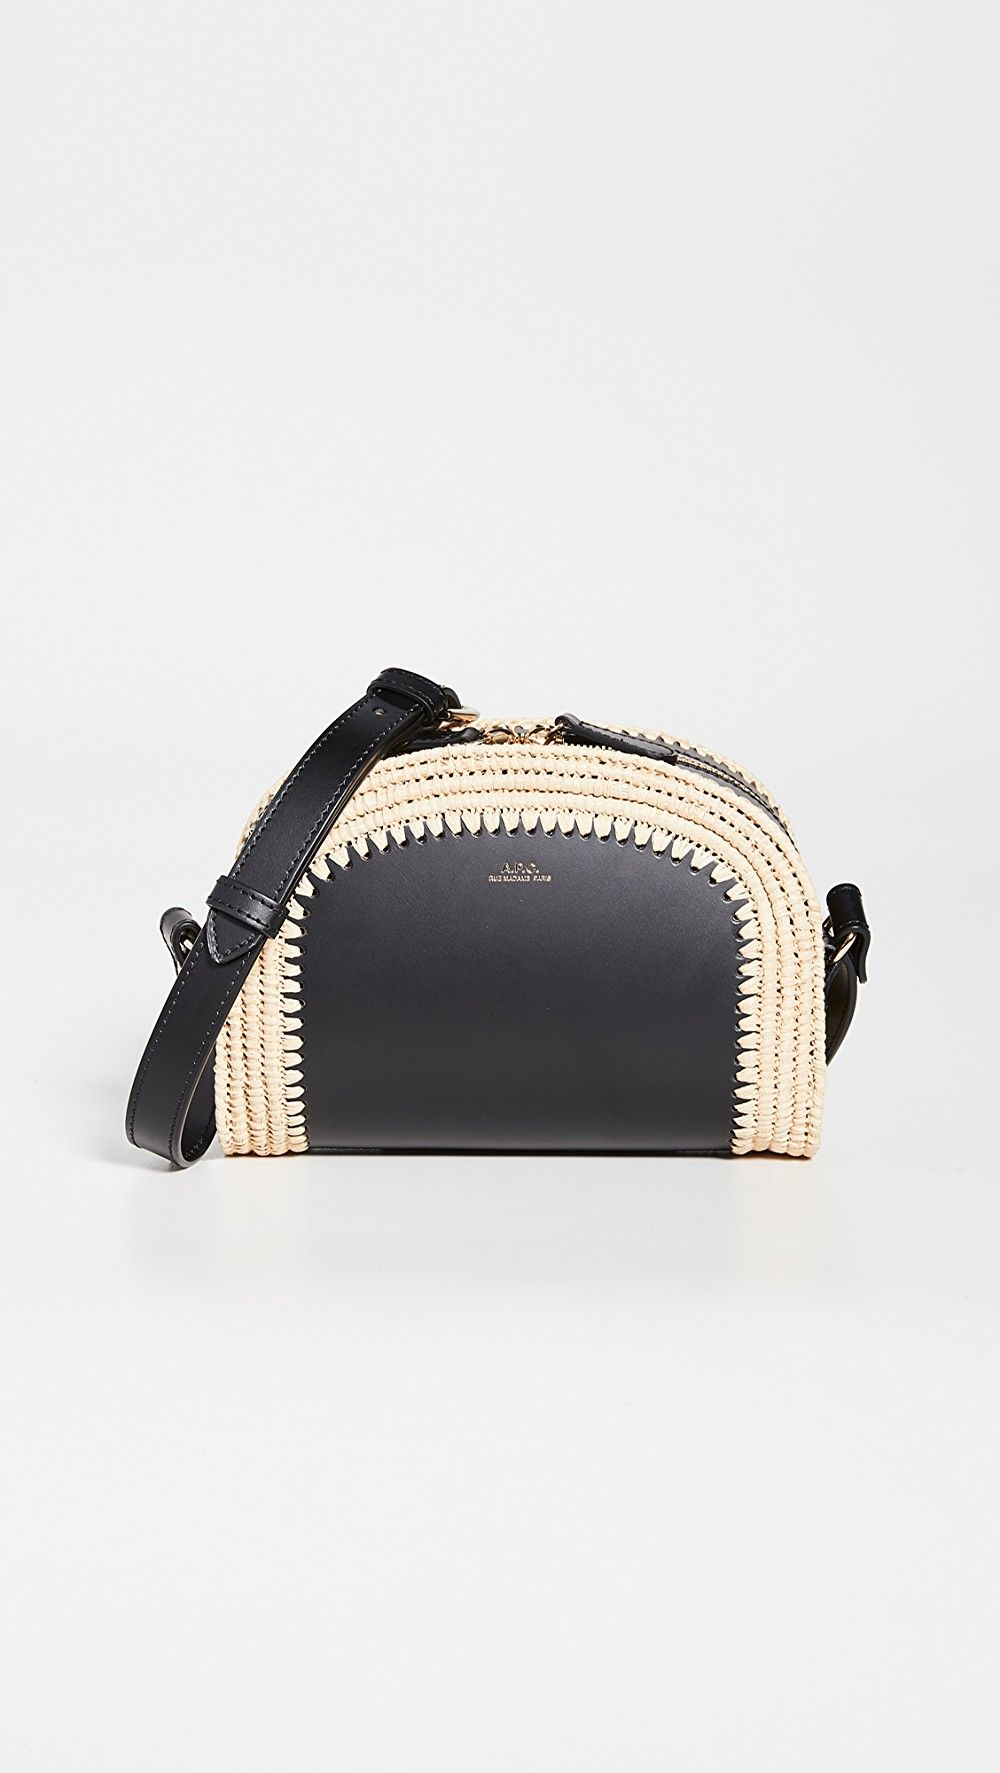 Different Weather In PinkWaterproof Non-Slip Wearable Crossbody Bag fitness bag Shoulder Bag